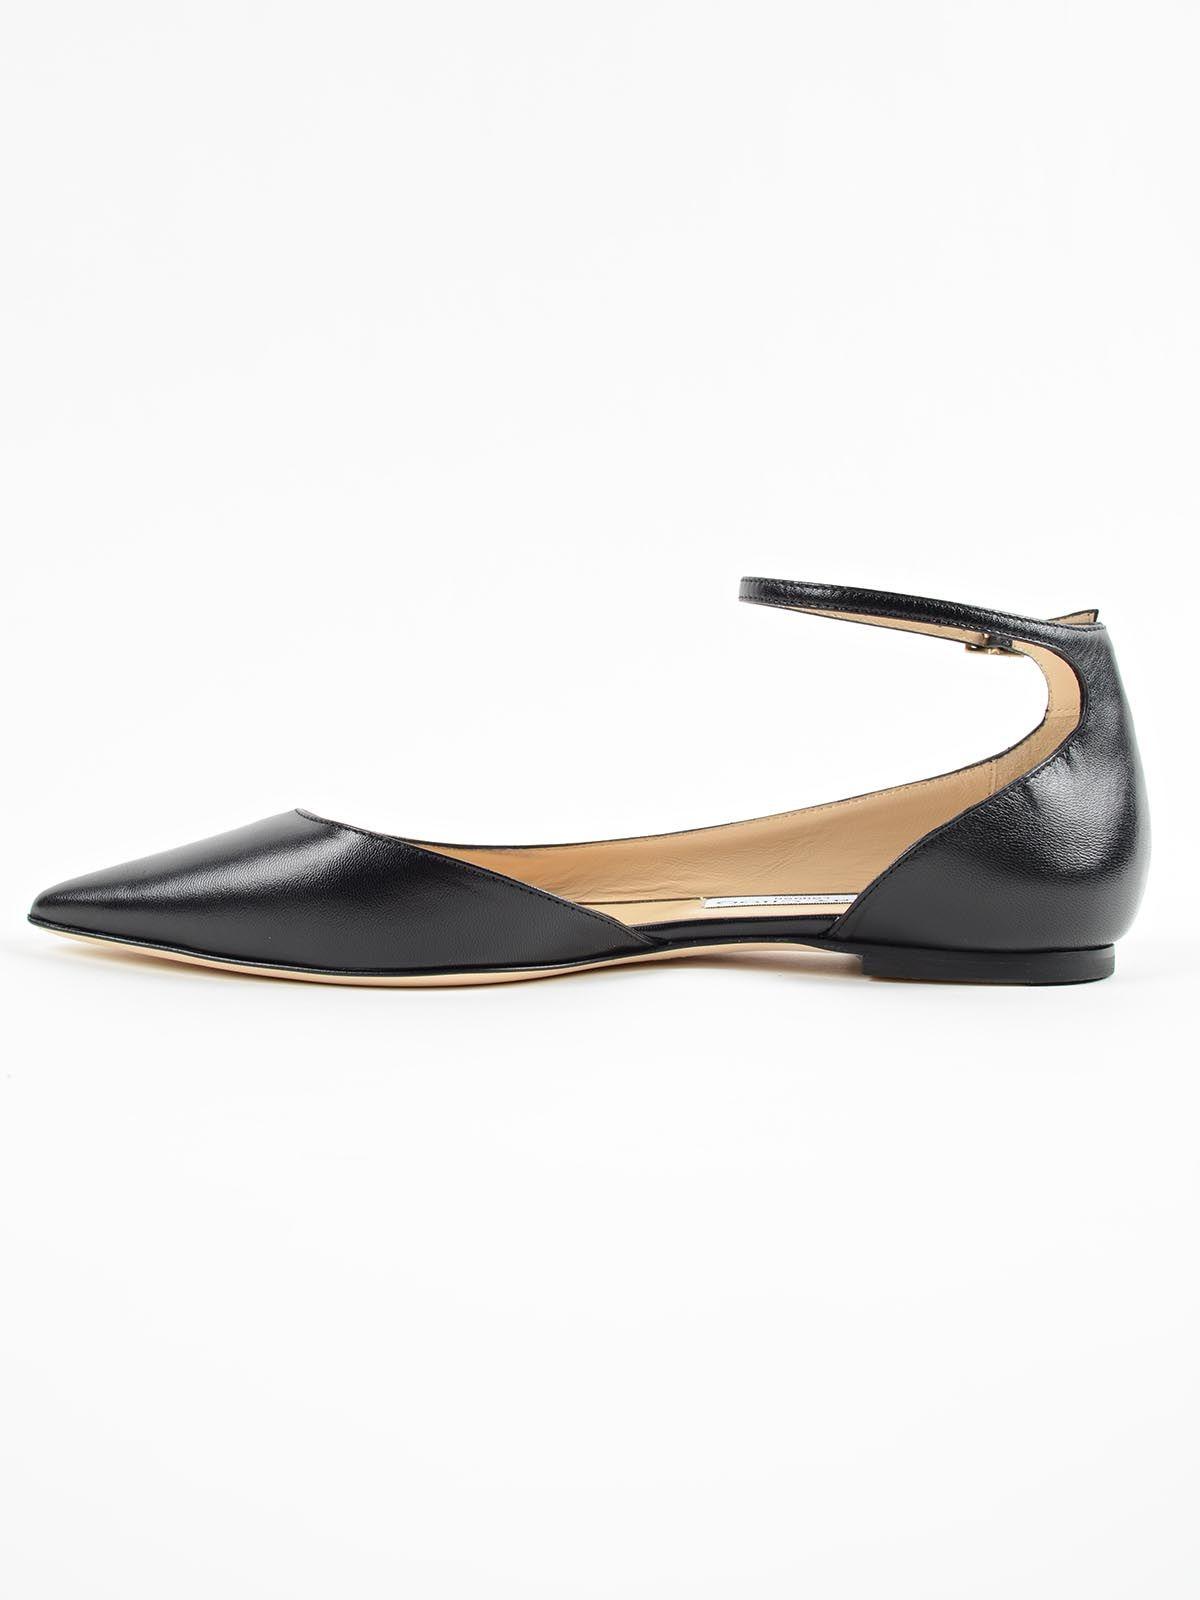 jimmy choo jimmy choo ballerina black women 39 s shoes italist. Black Bedroom Furniture Sets. Home Design Ideas